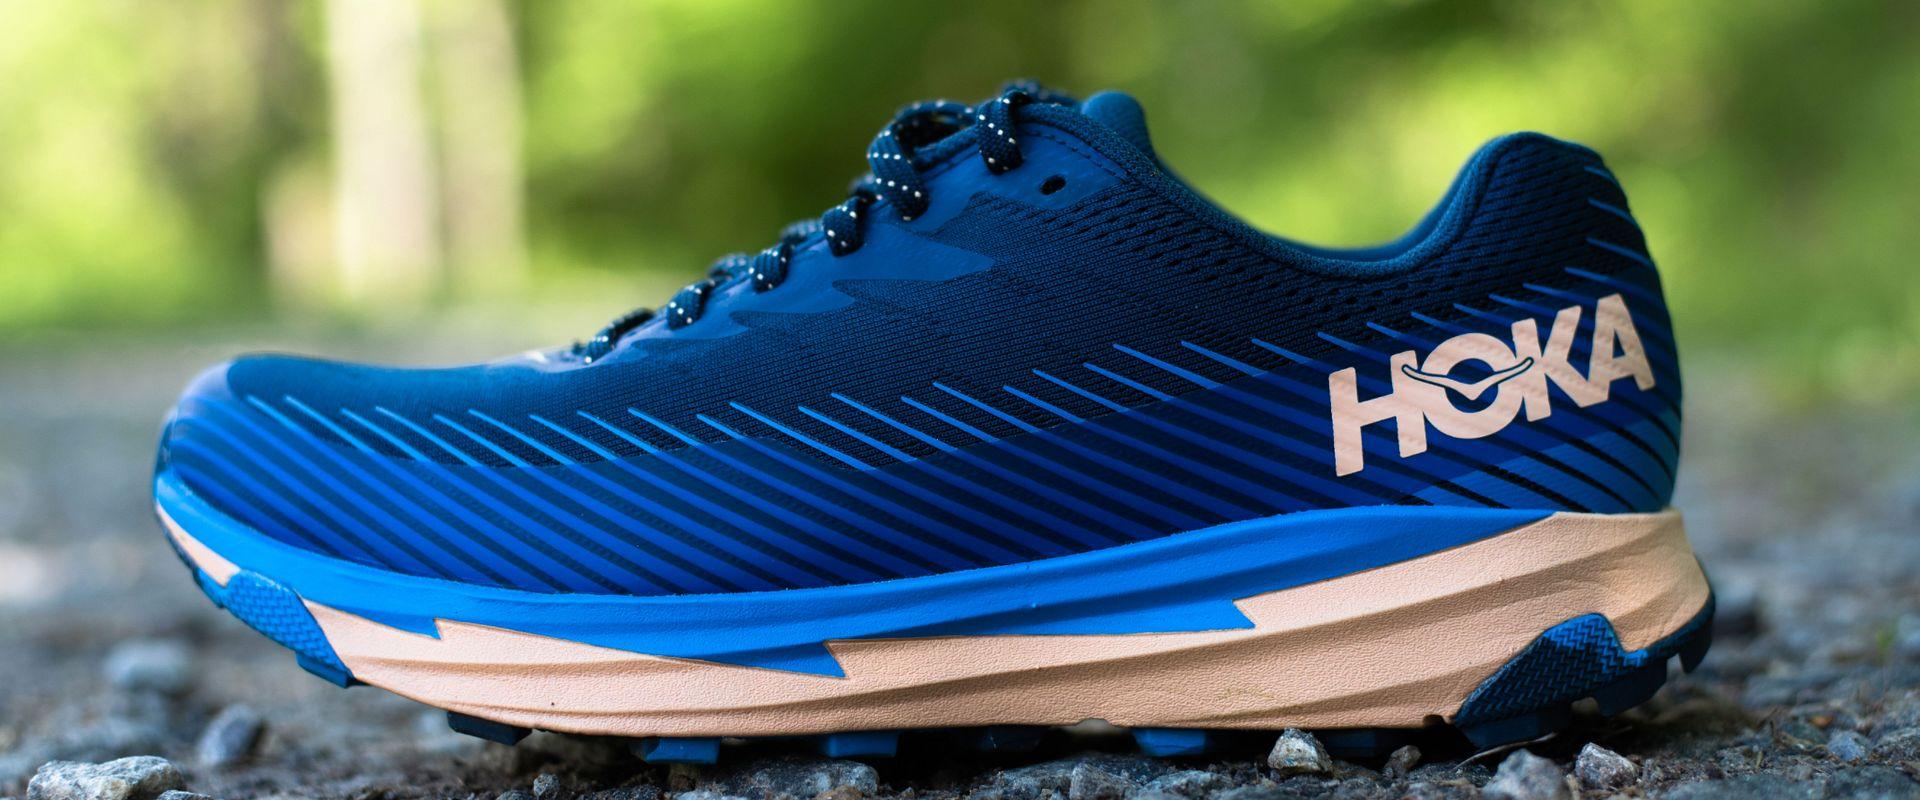 Shoe Review: HOKA Torrent 2   Fleet Feet